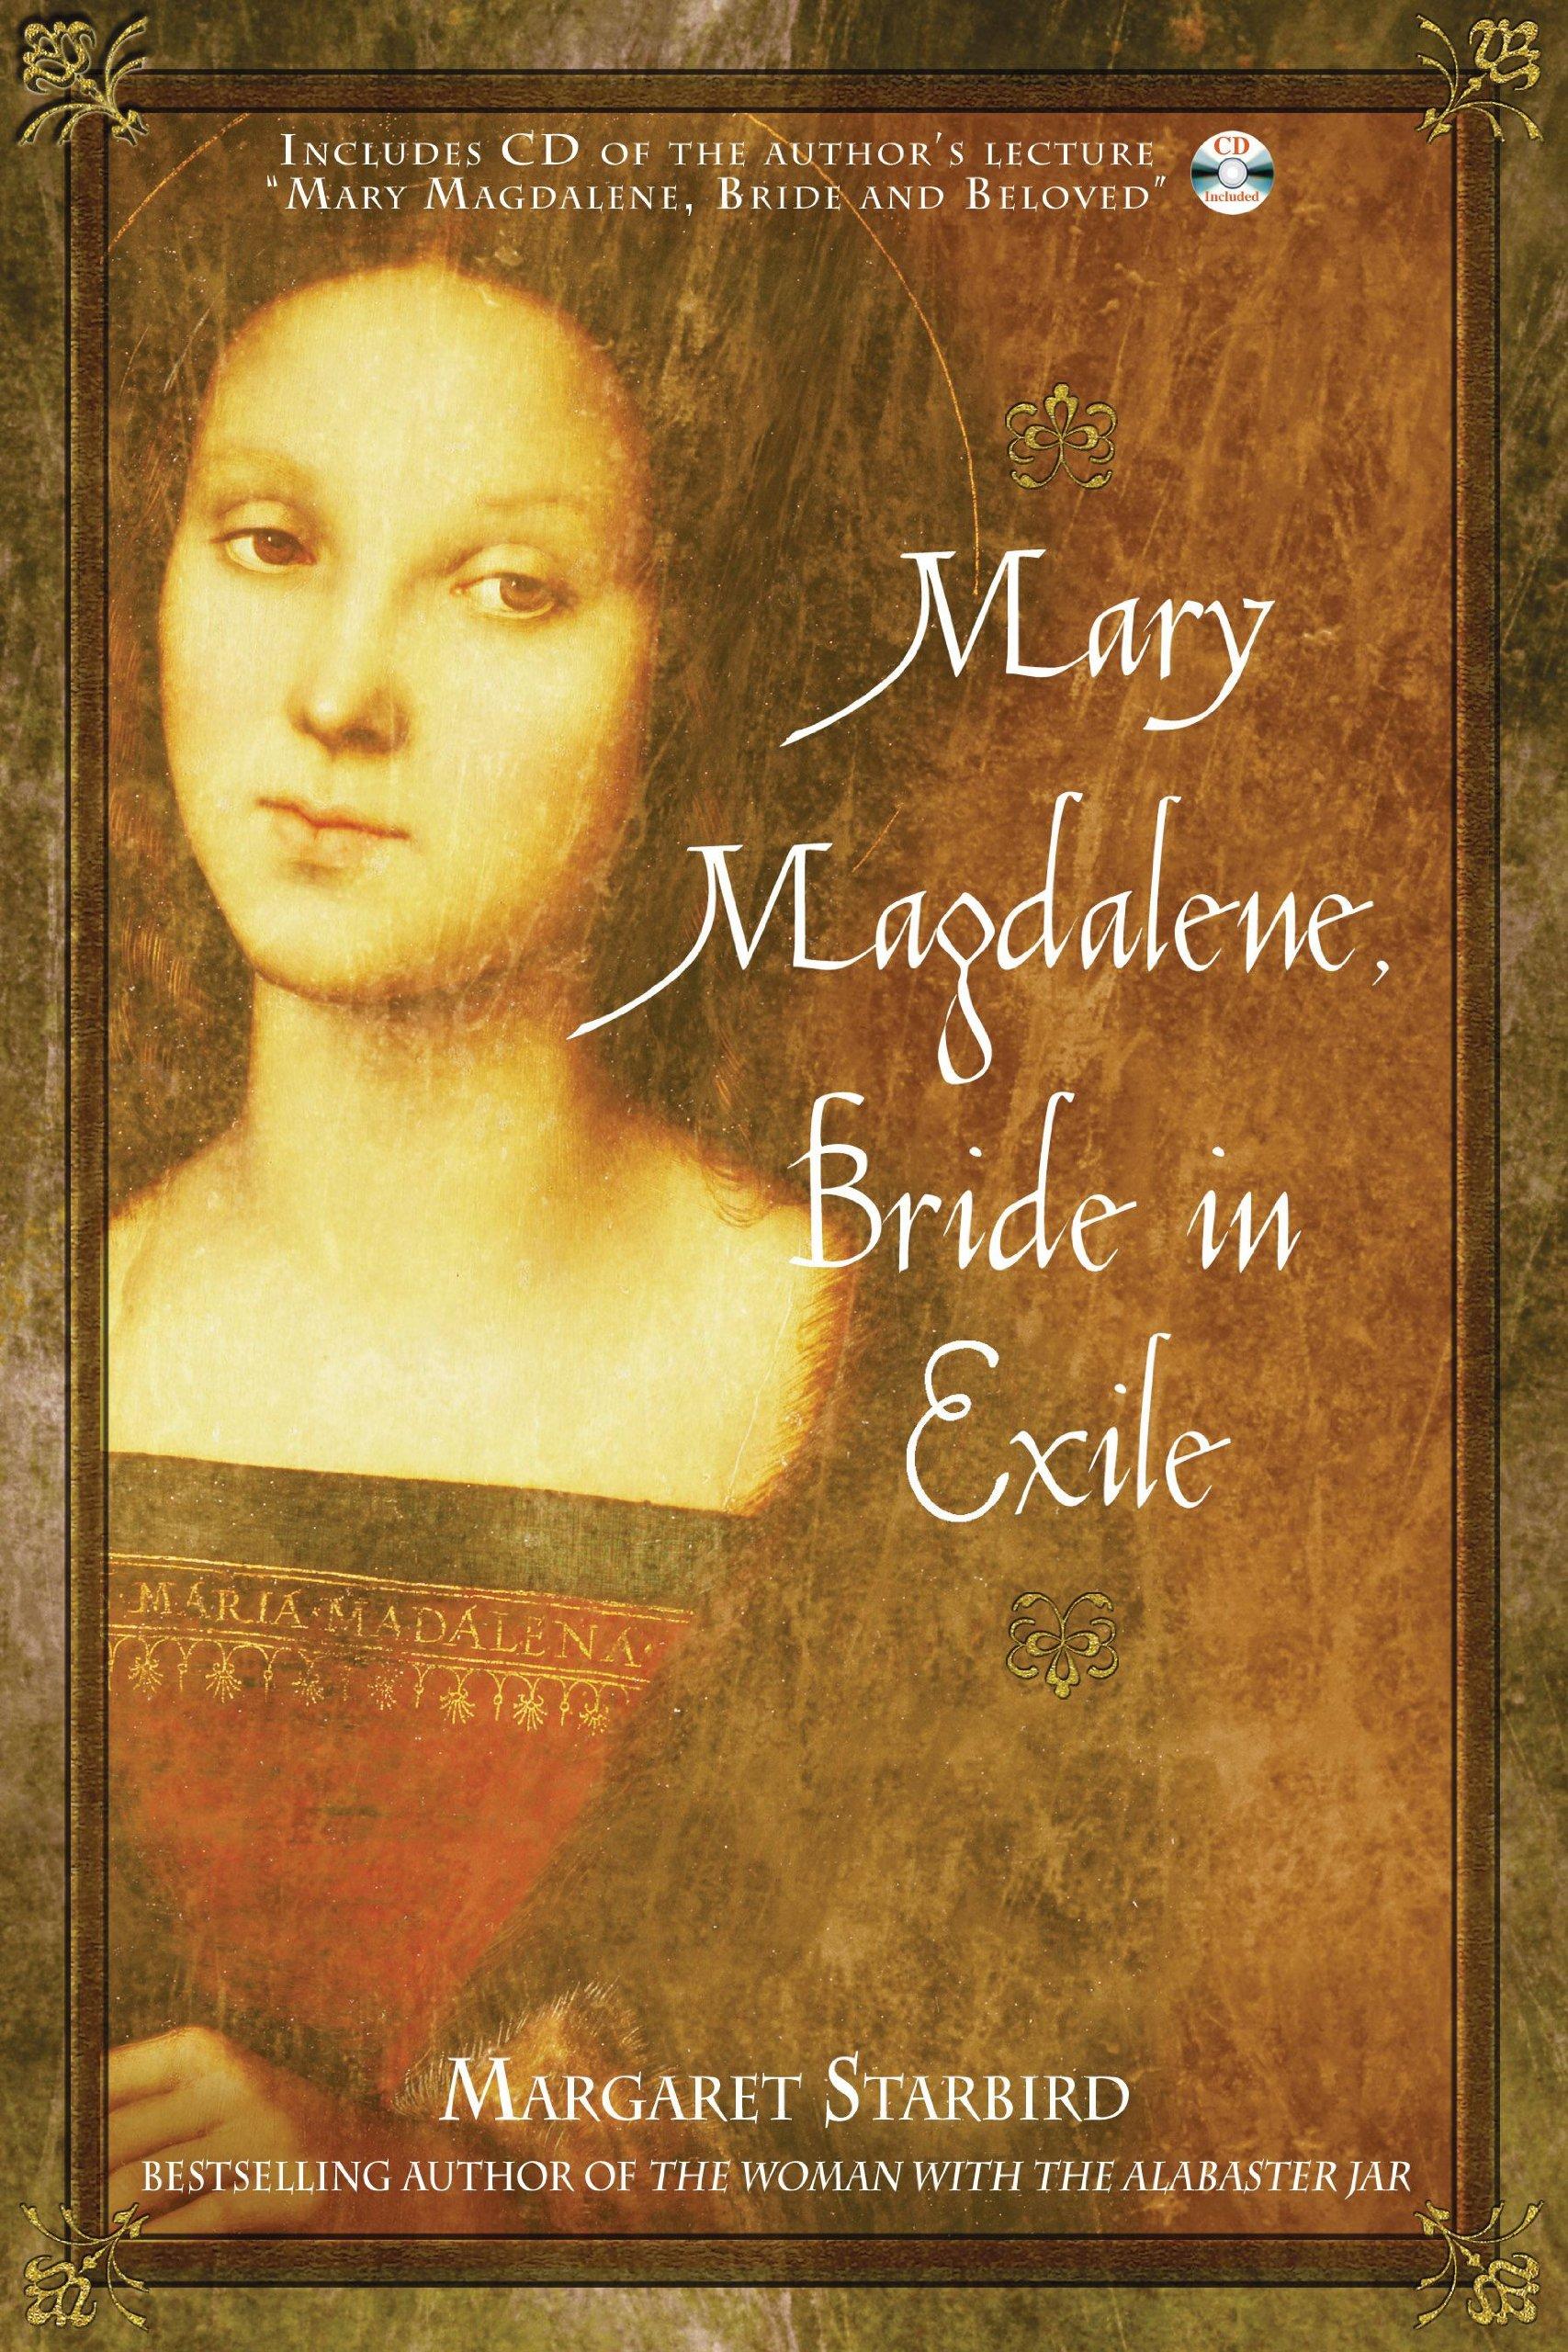 Mary Magdalene, Bride in Exile: Margaret Starbird: 9781591430544:  Amazon.com: Books